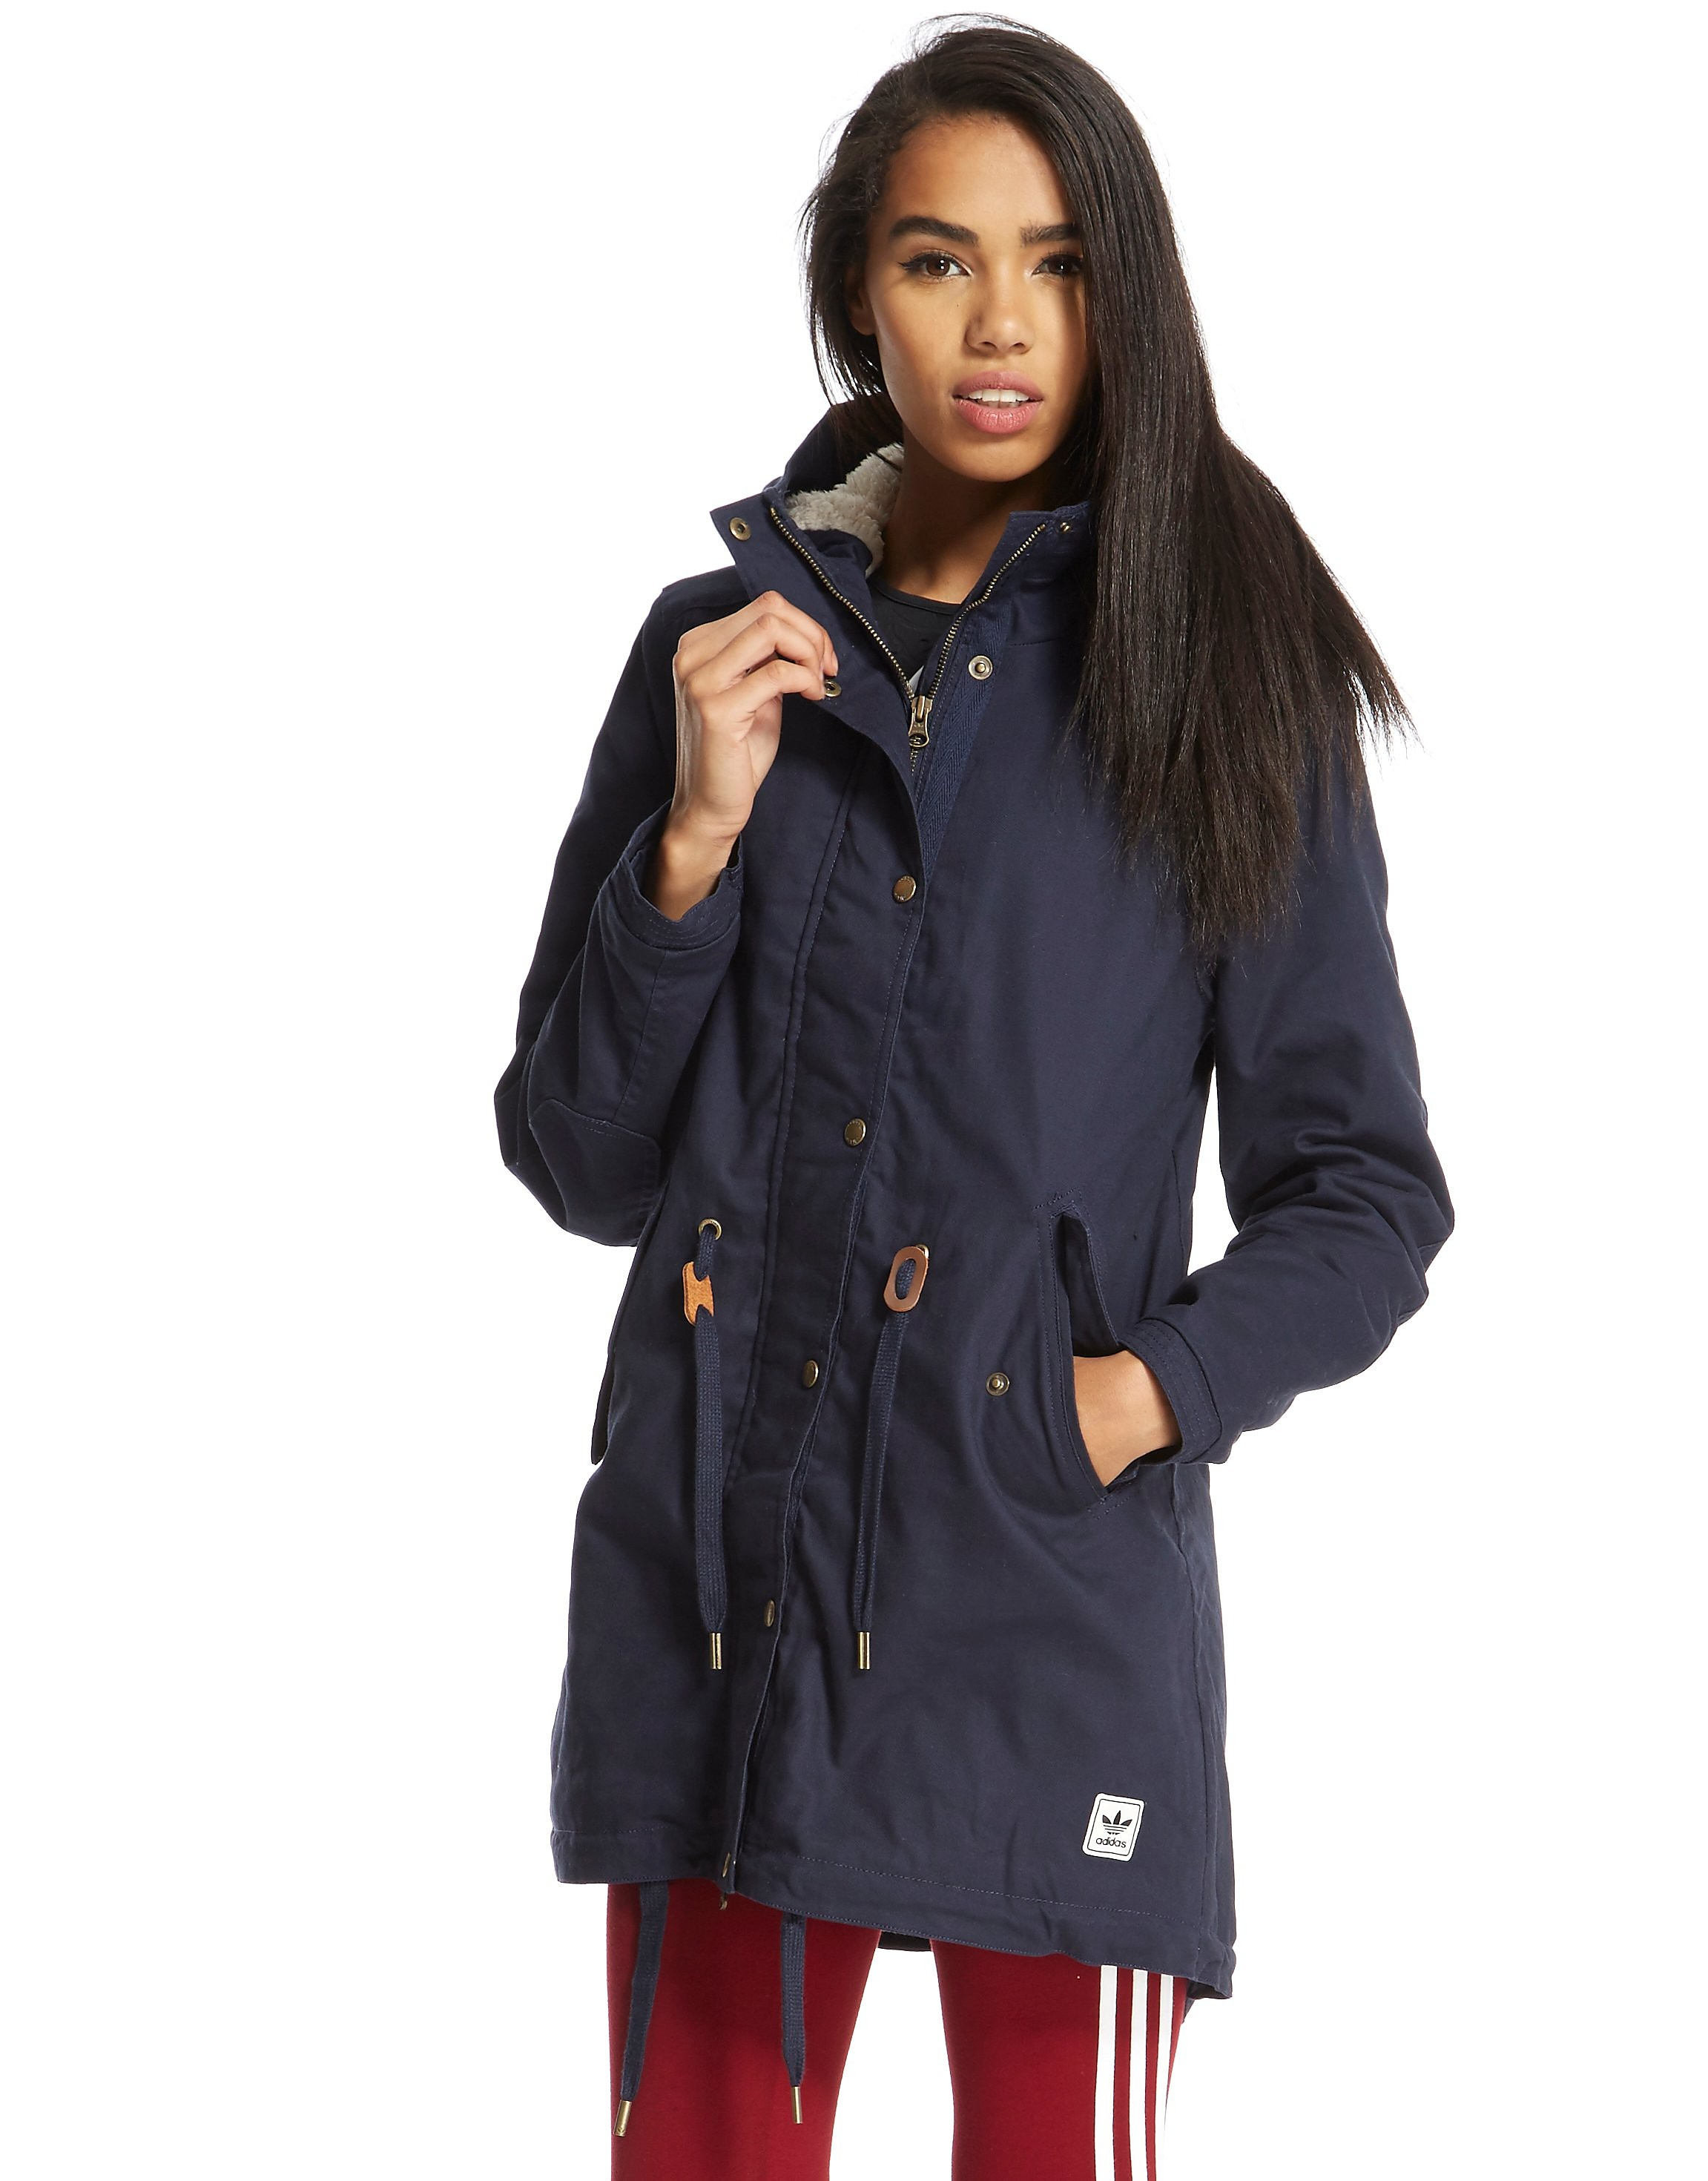 adidas Originals Winter Parka Jacket